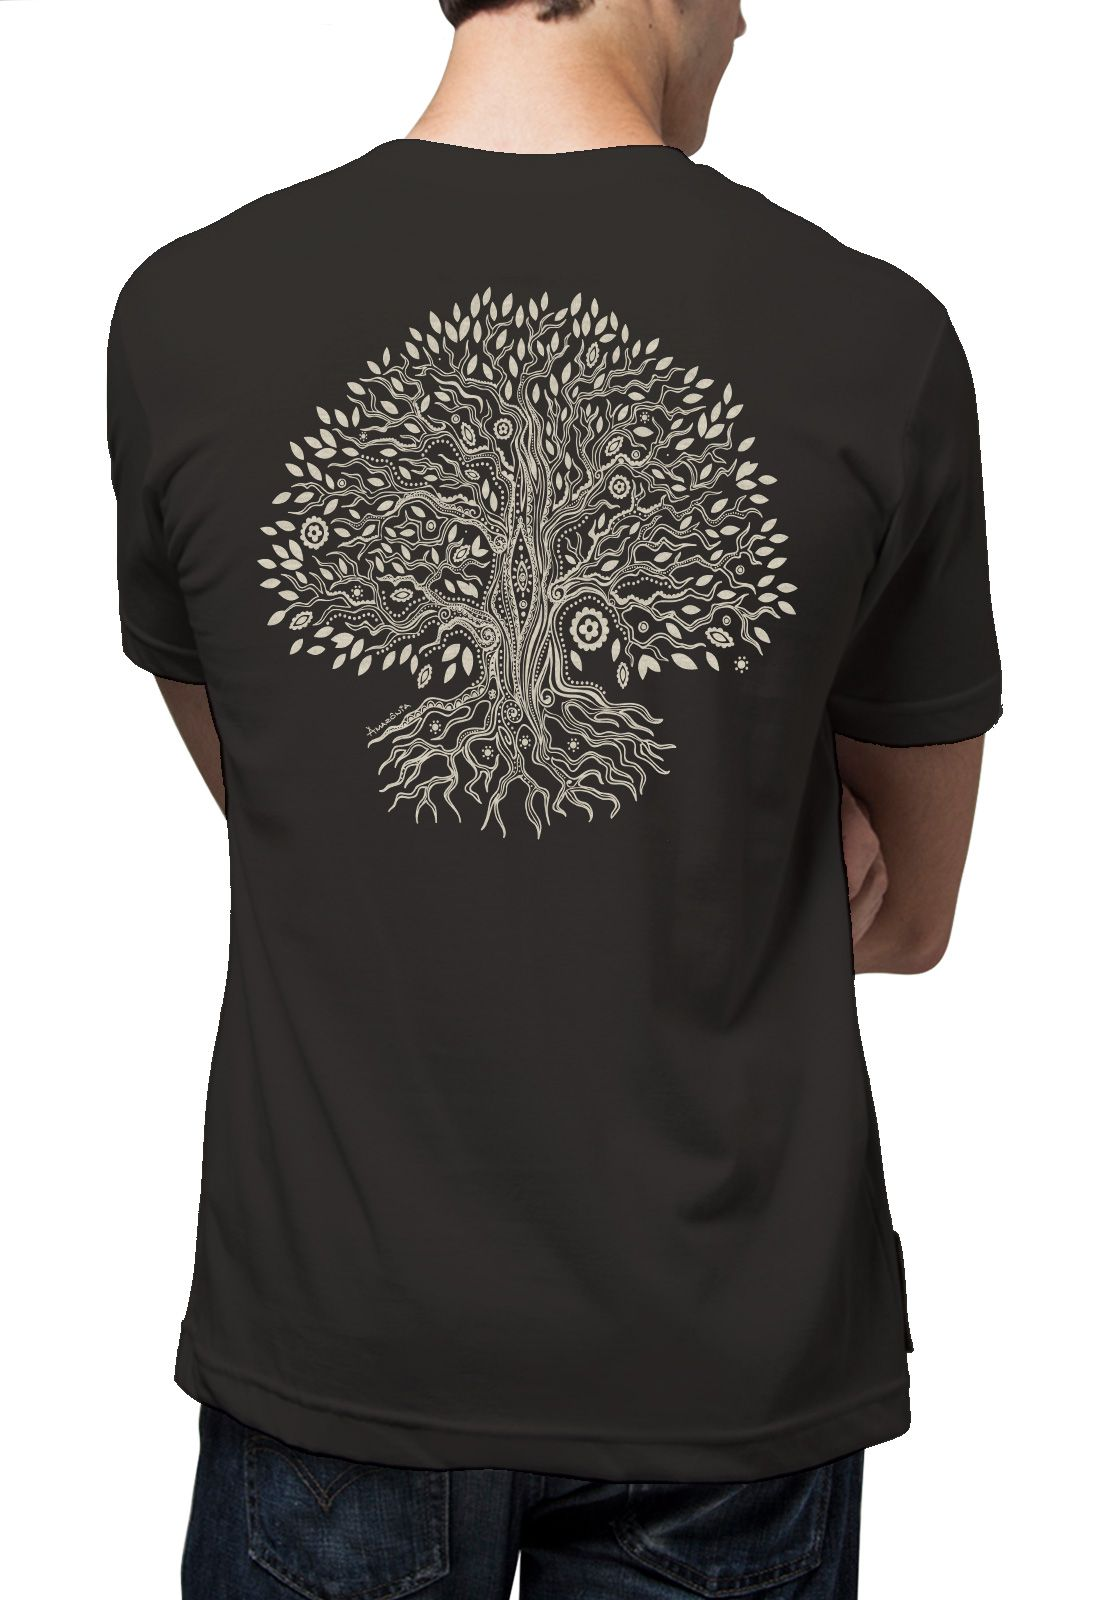 Camiseta Amazônia Mistycal Forest - Cinza Escuro